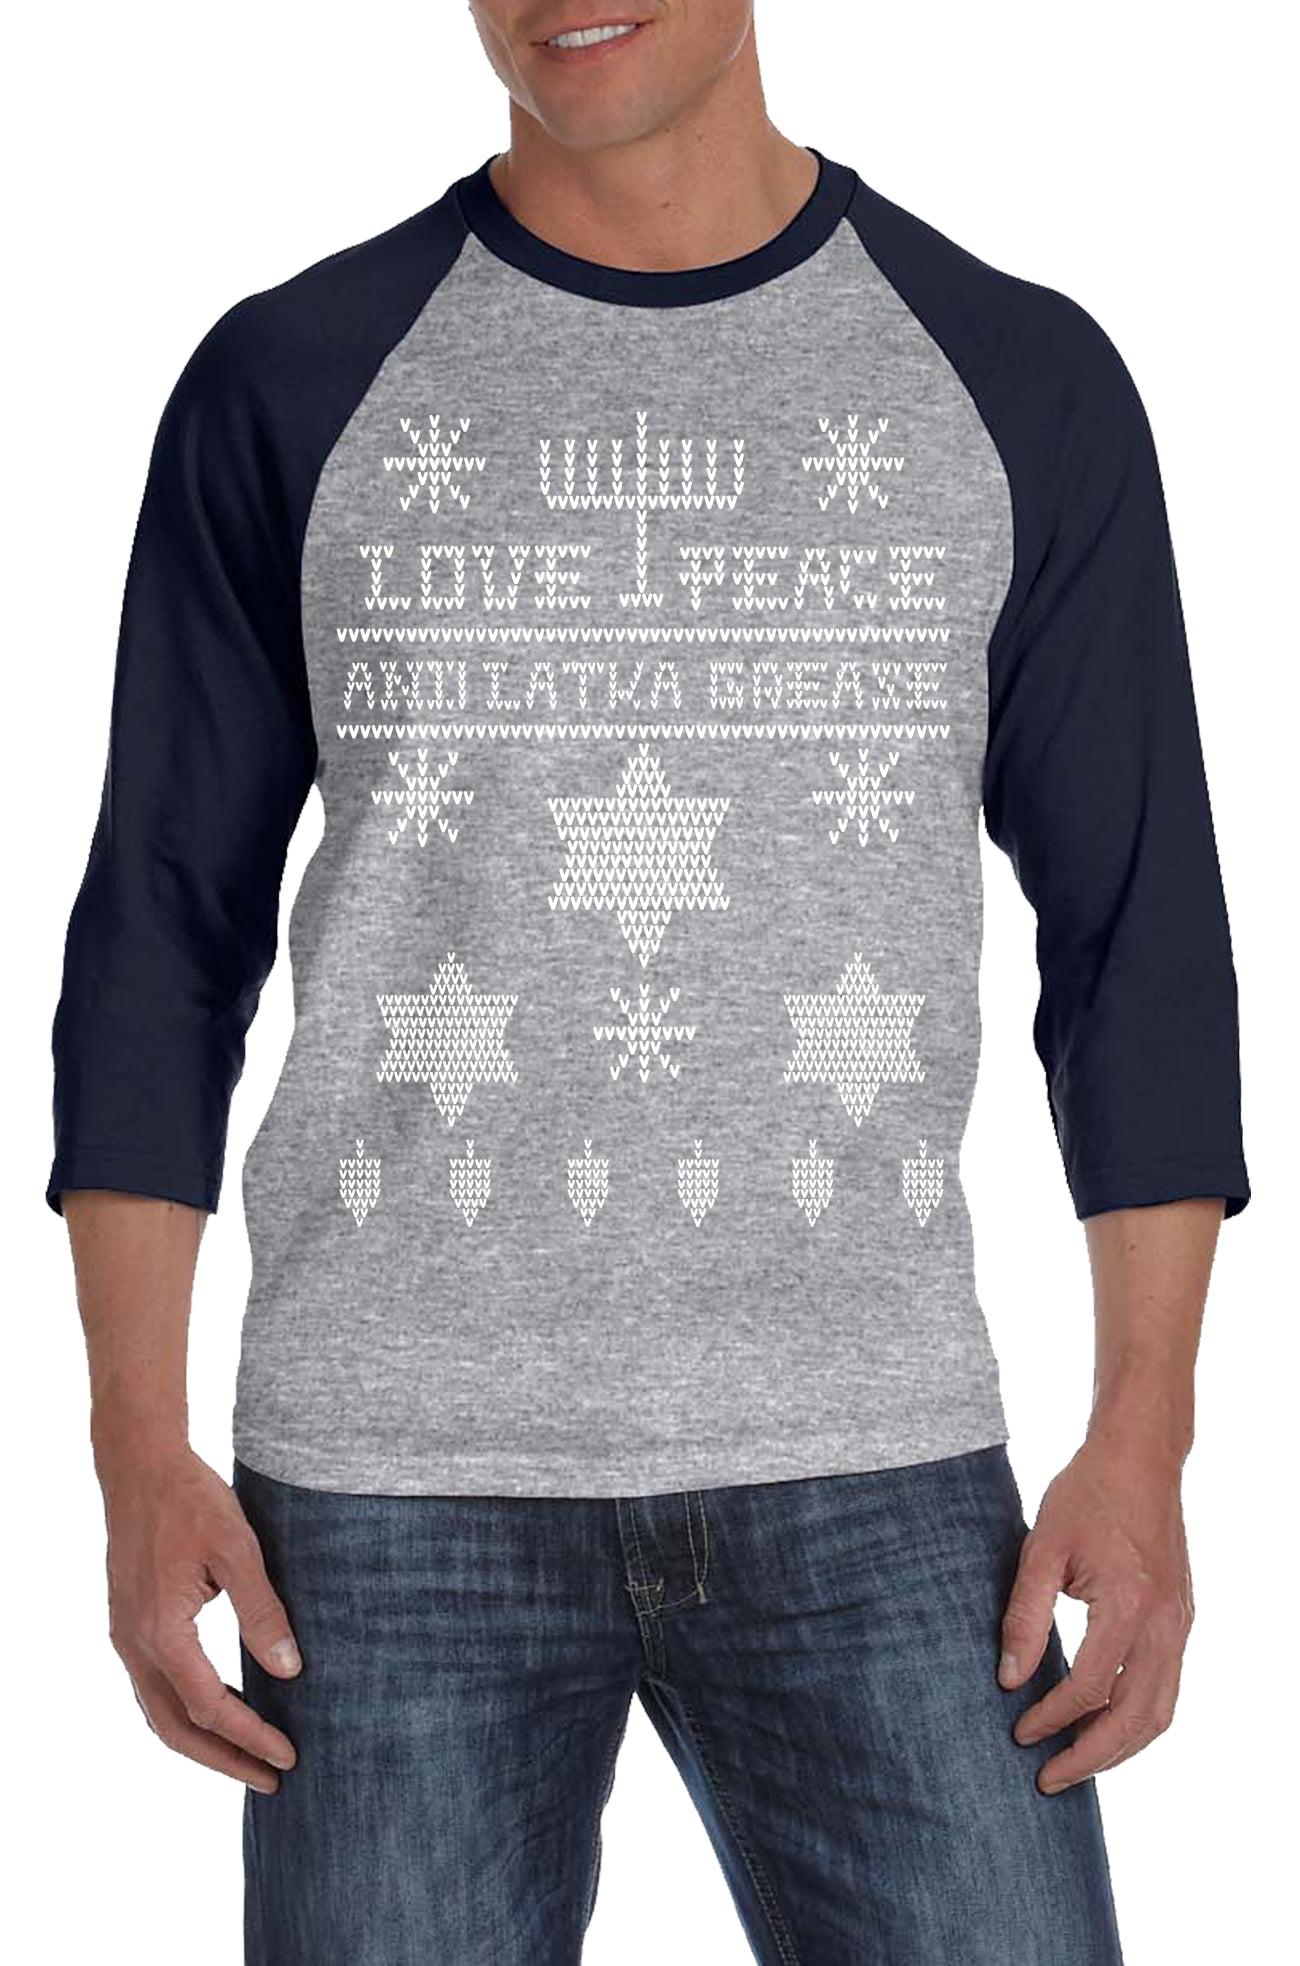 Crazy Dog TShirts Ugly Hanukkah Sweater RAGLAN Funny Ugly Sweater Shirt Holiday... by Crazy Dog T-Shirts